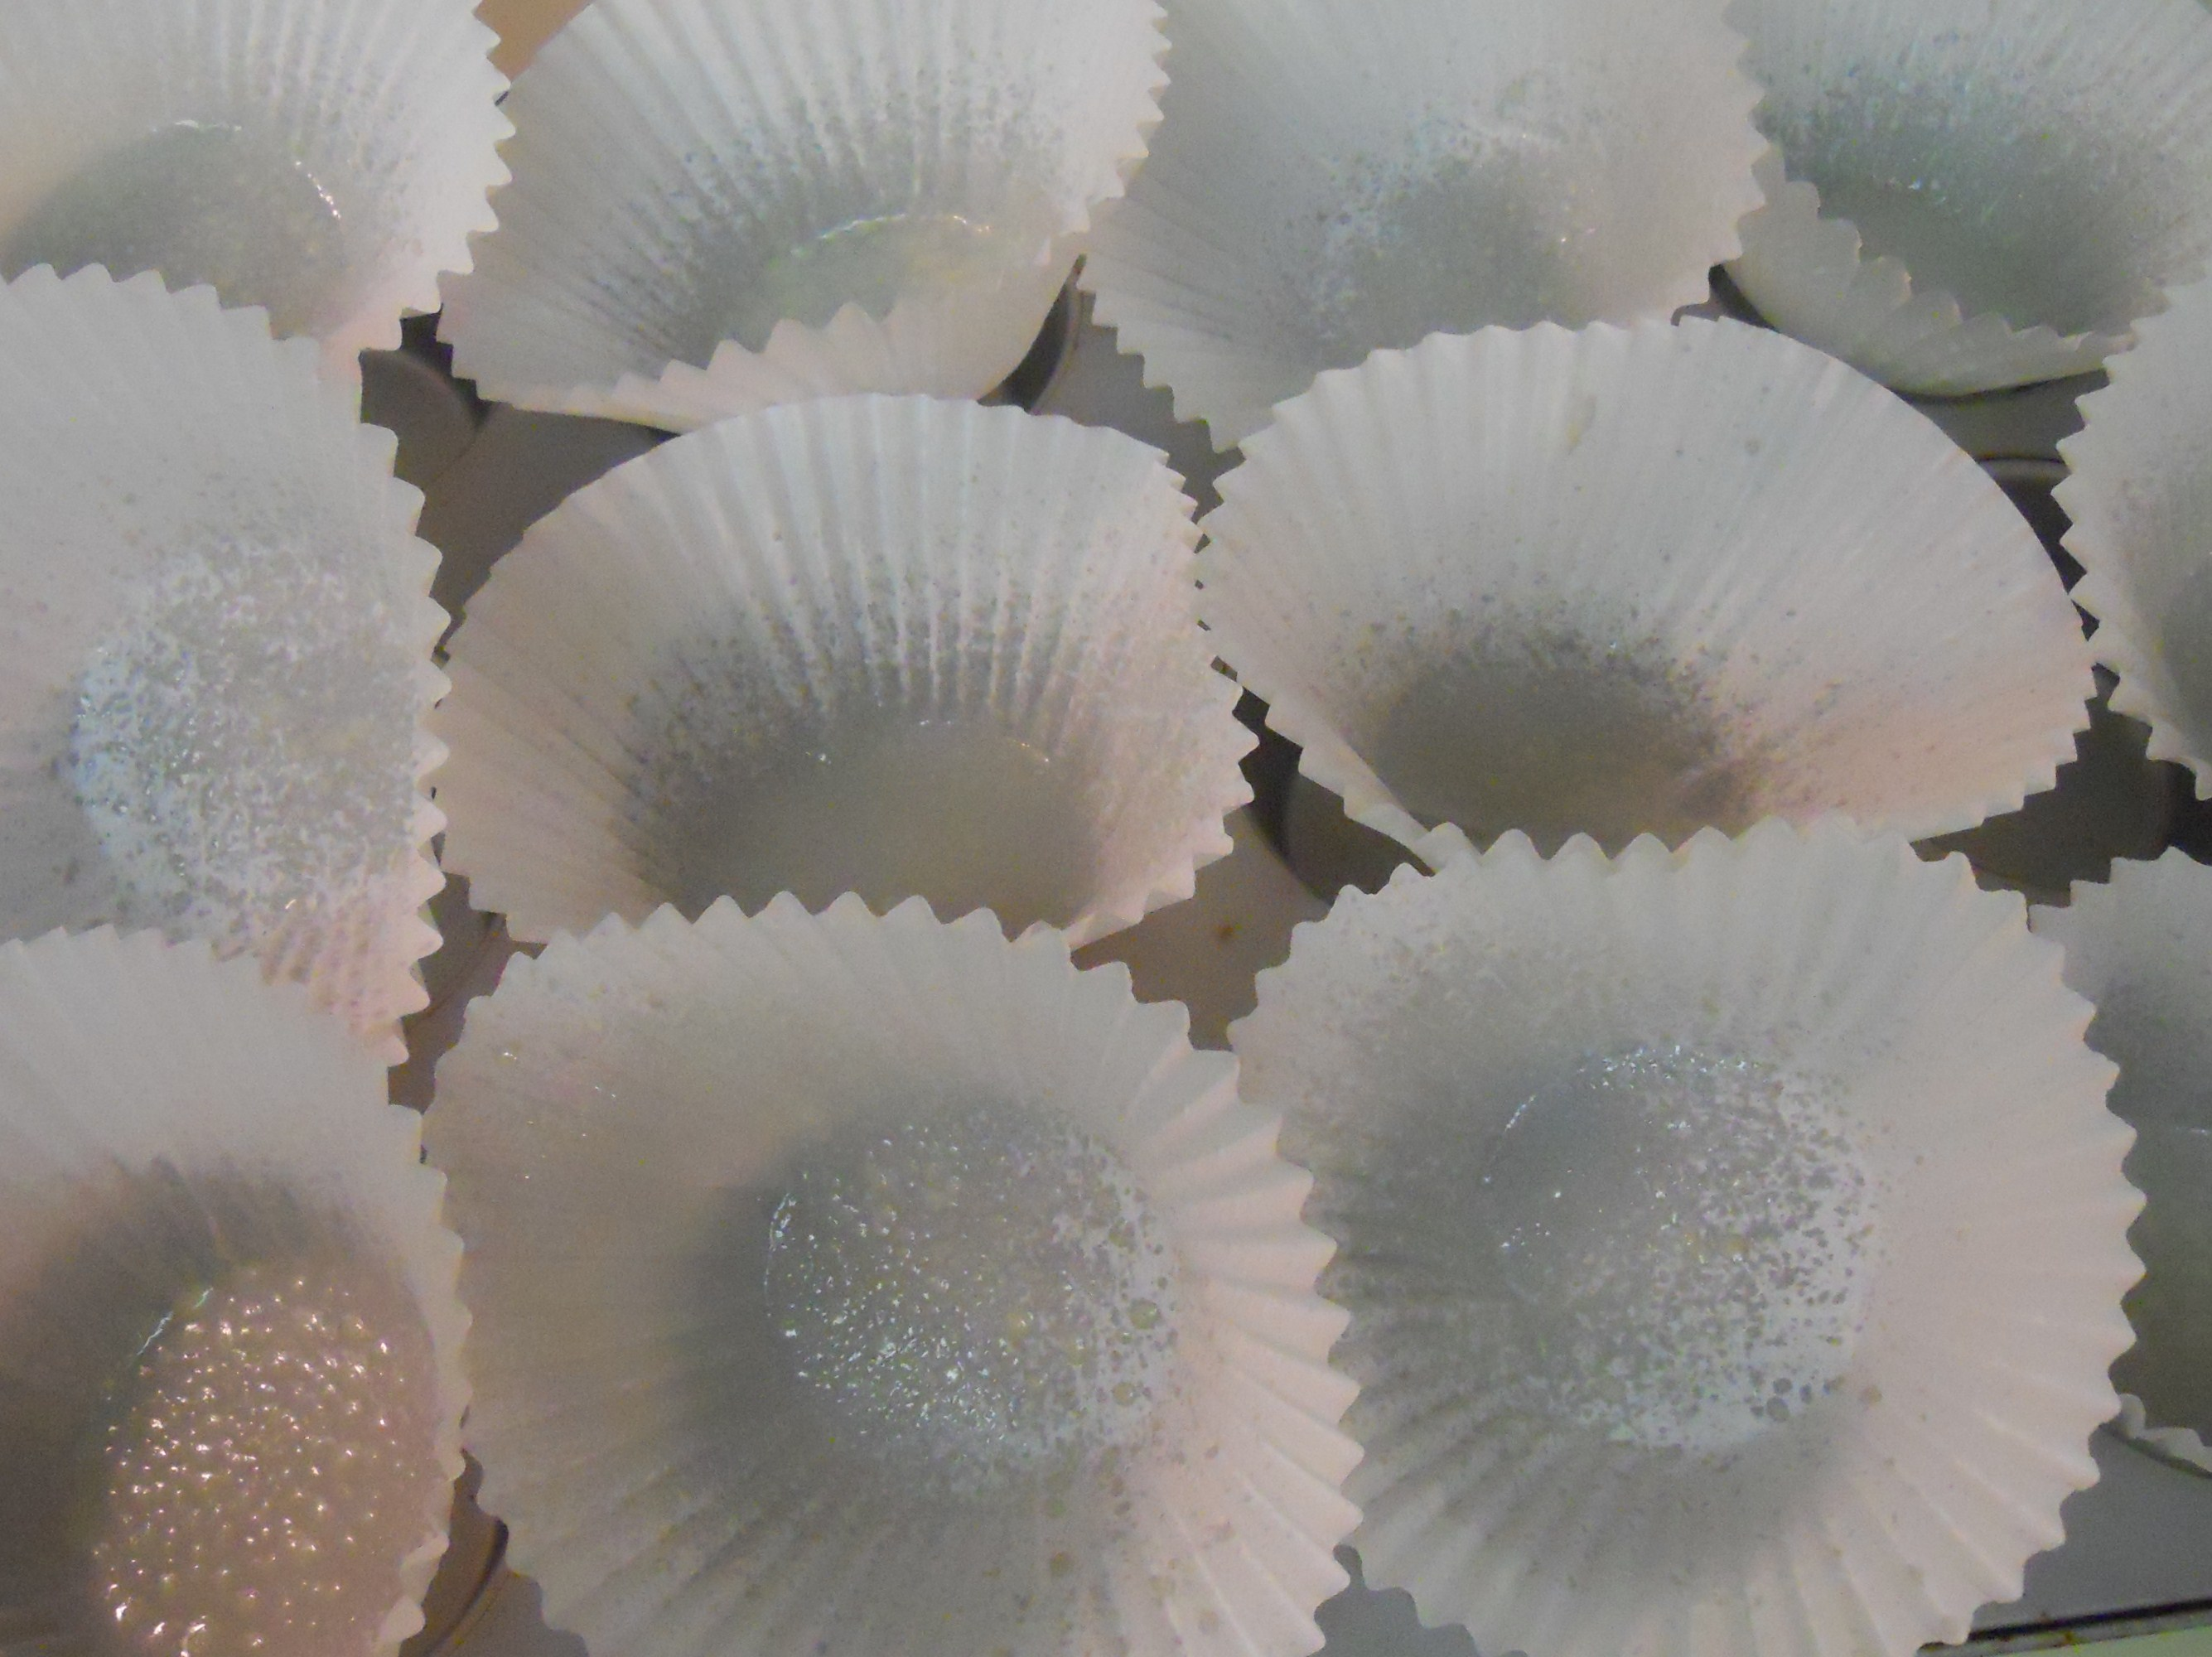 ... Cupcakes: Monkey Bread Jumbo Cupcakes. - Nibbles of Tidbits, a Food